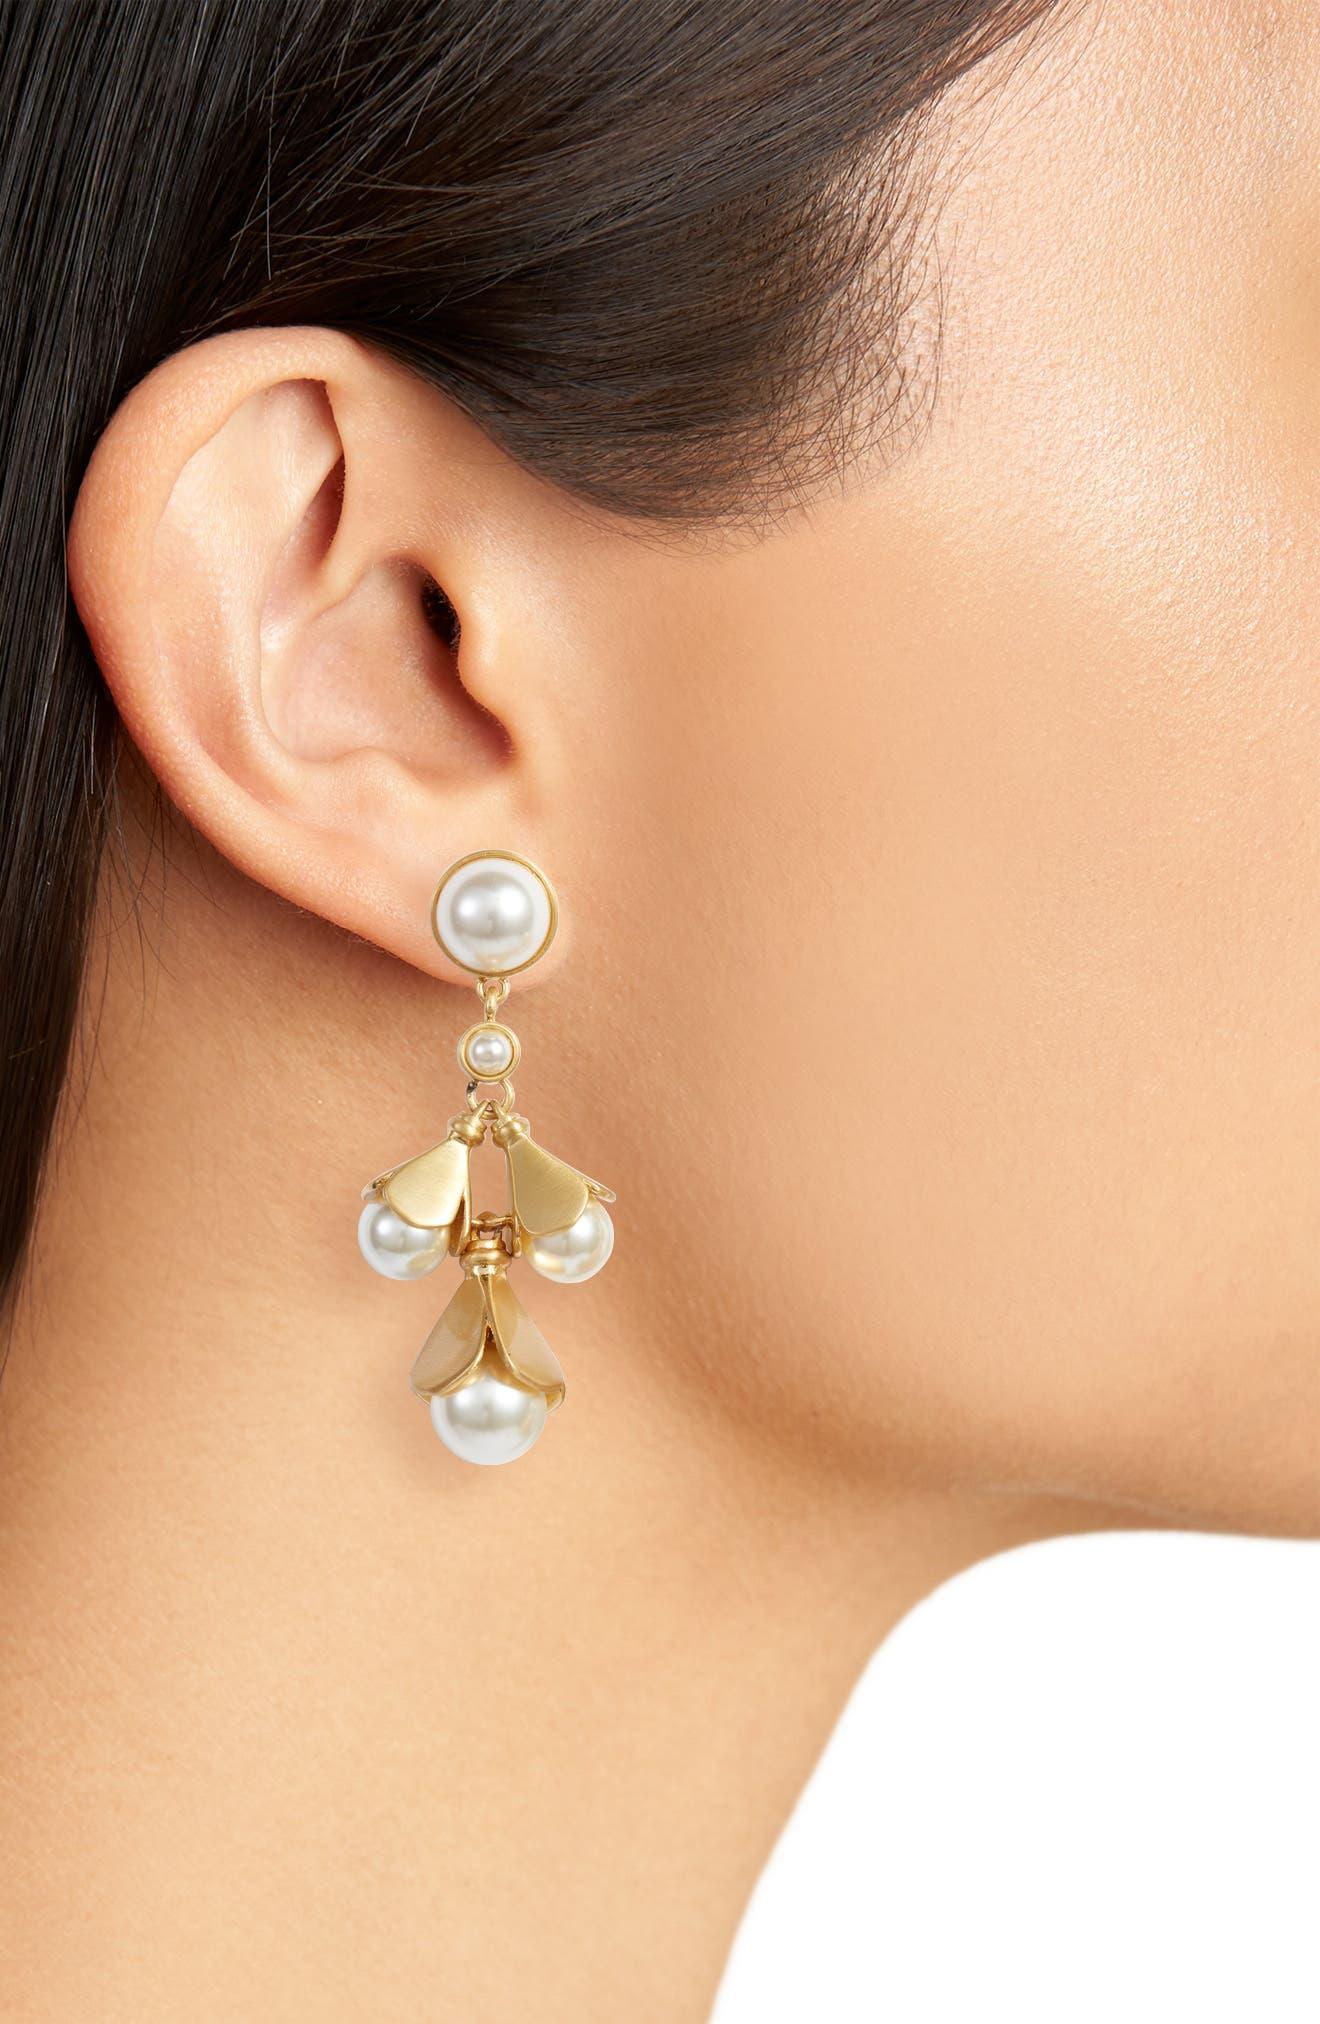 Bellflower Drop Earrings,                             Alternate thumbnail 2, color,                             PEARL / BRASS